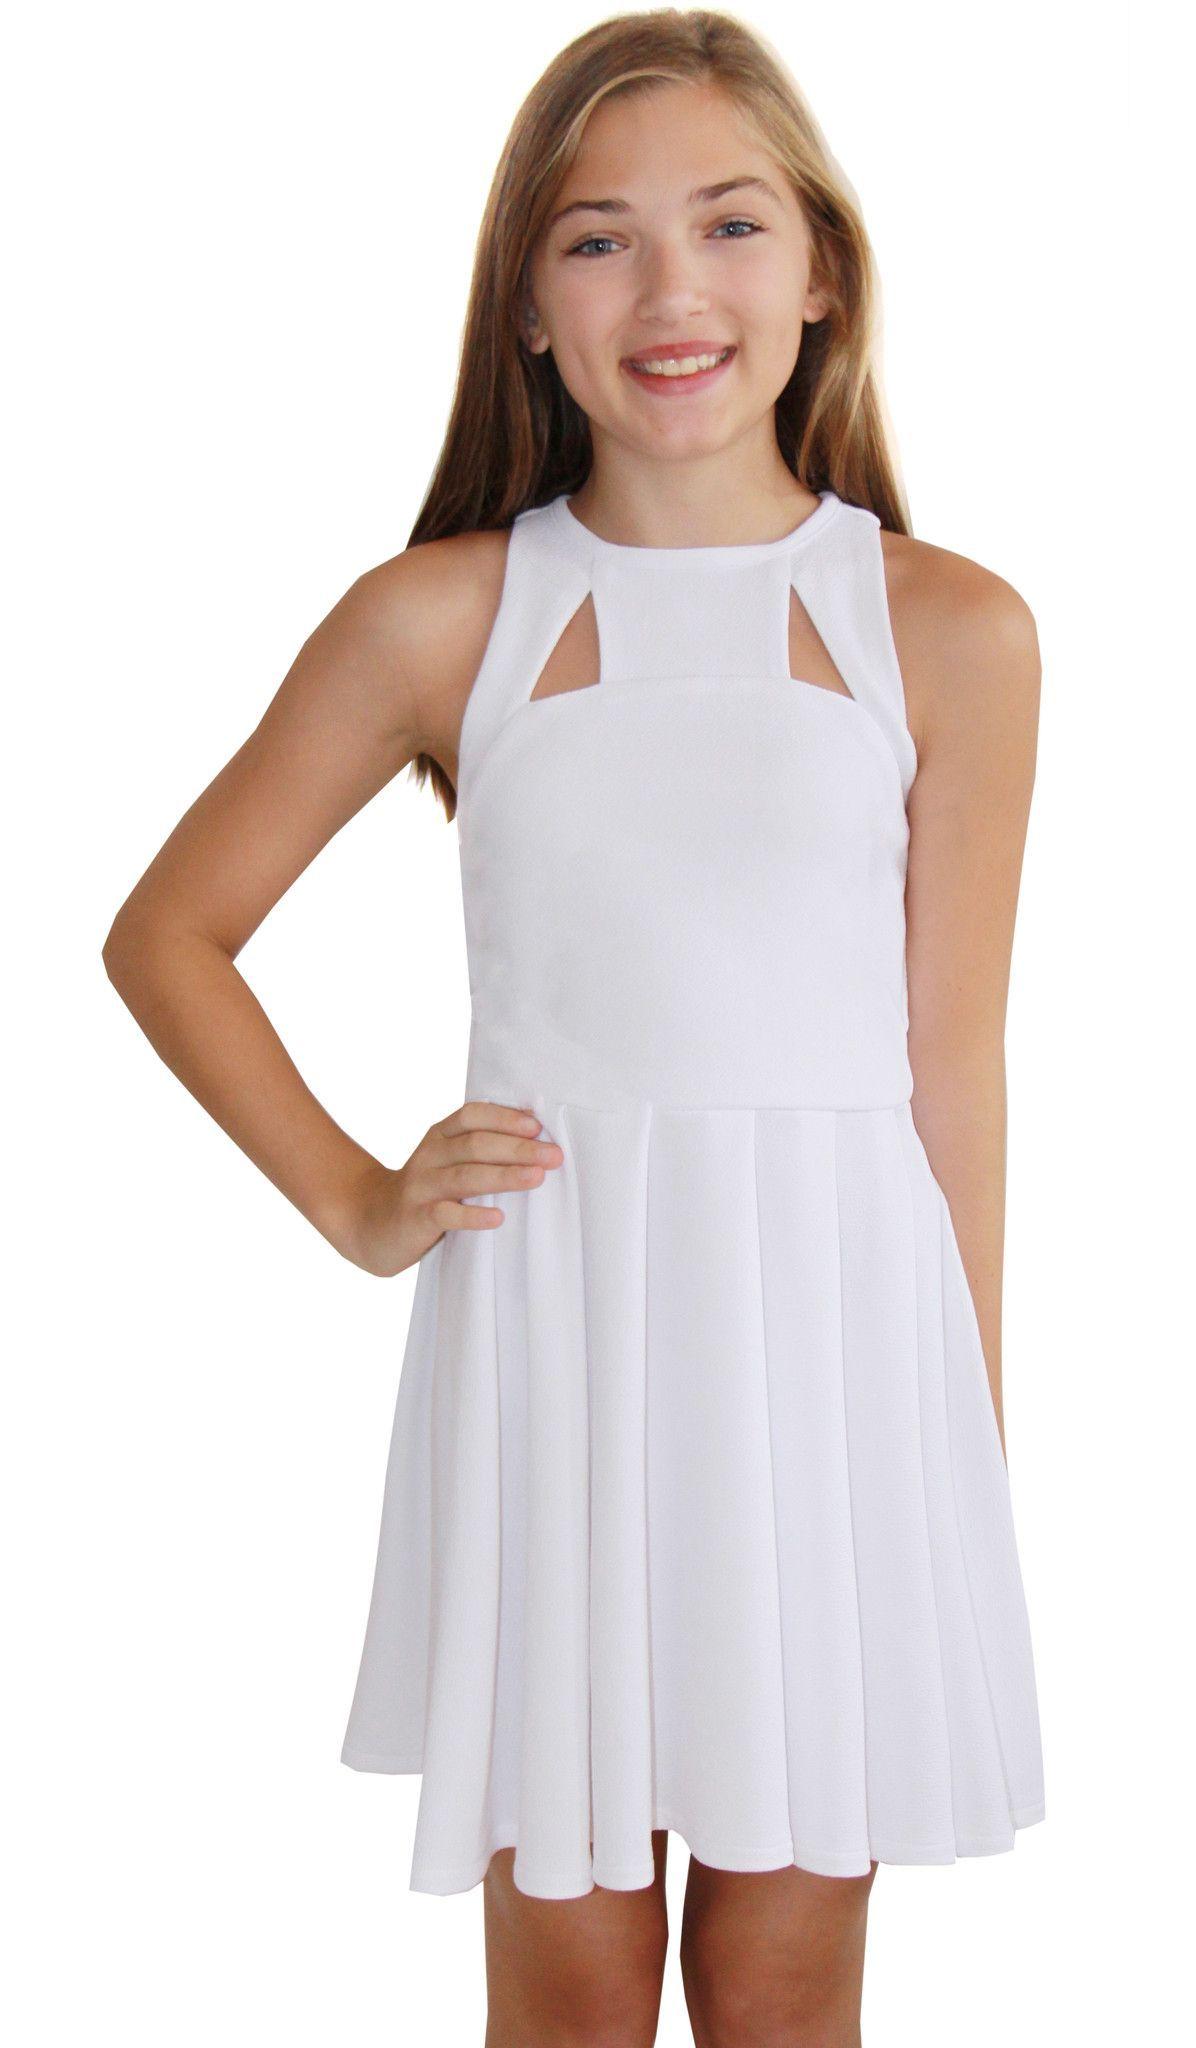 THE SUMMER DRESS -6 WHITE  Dresses for tweens, Cotillion